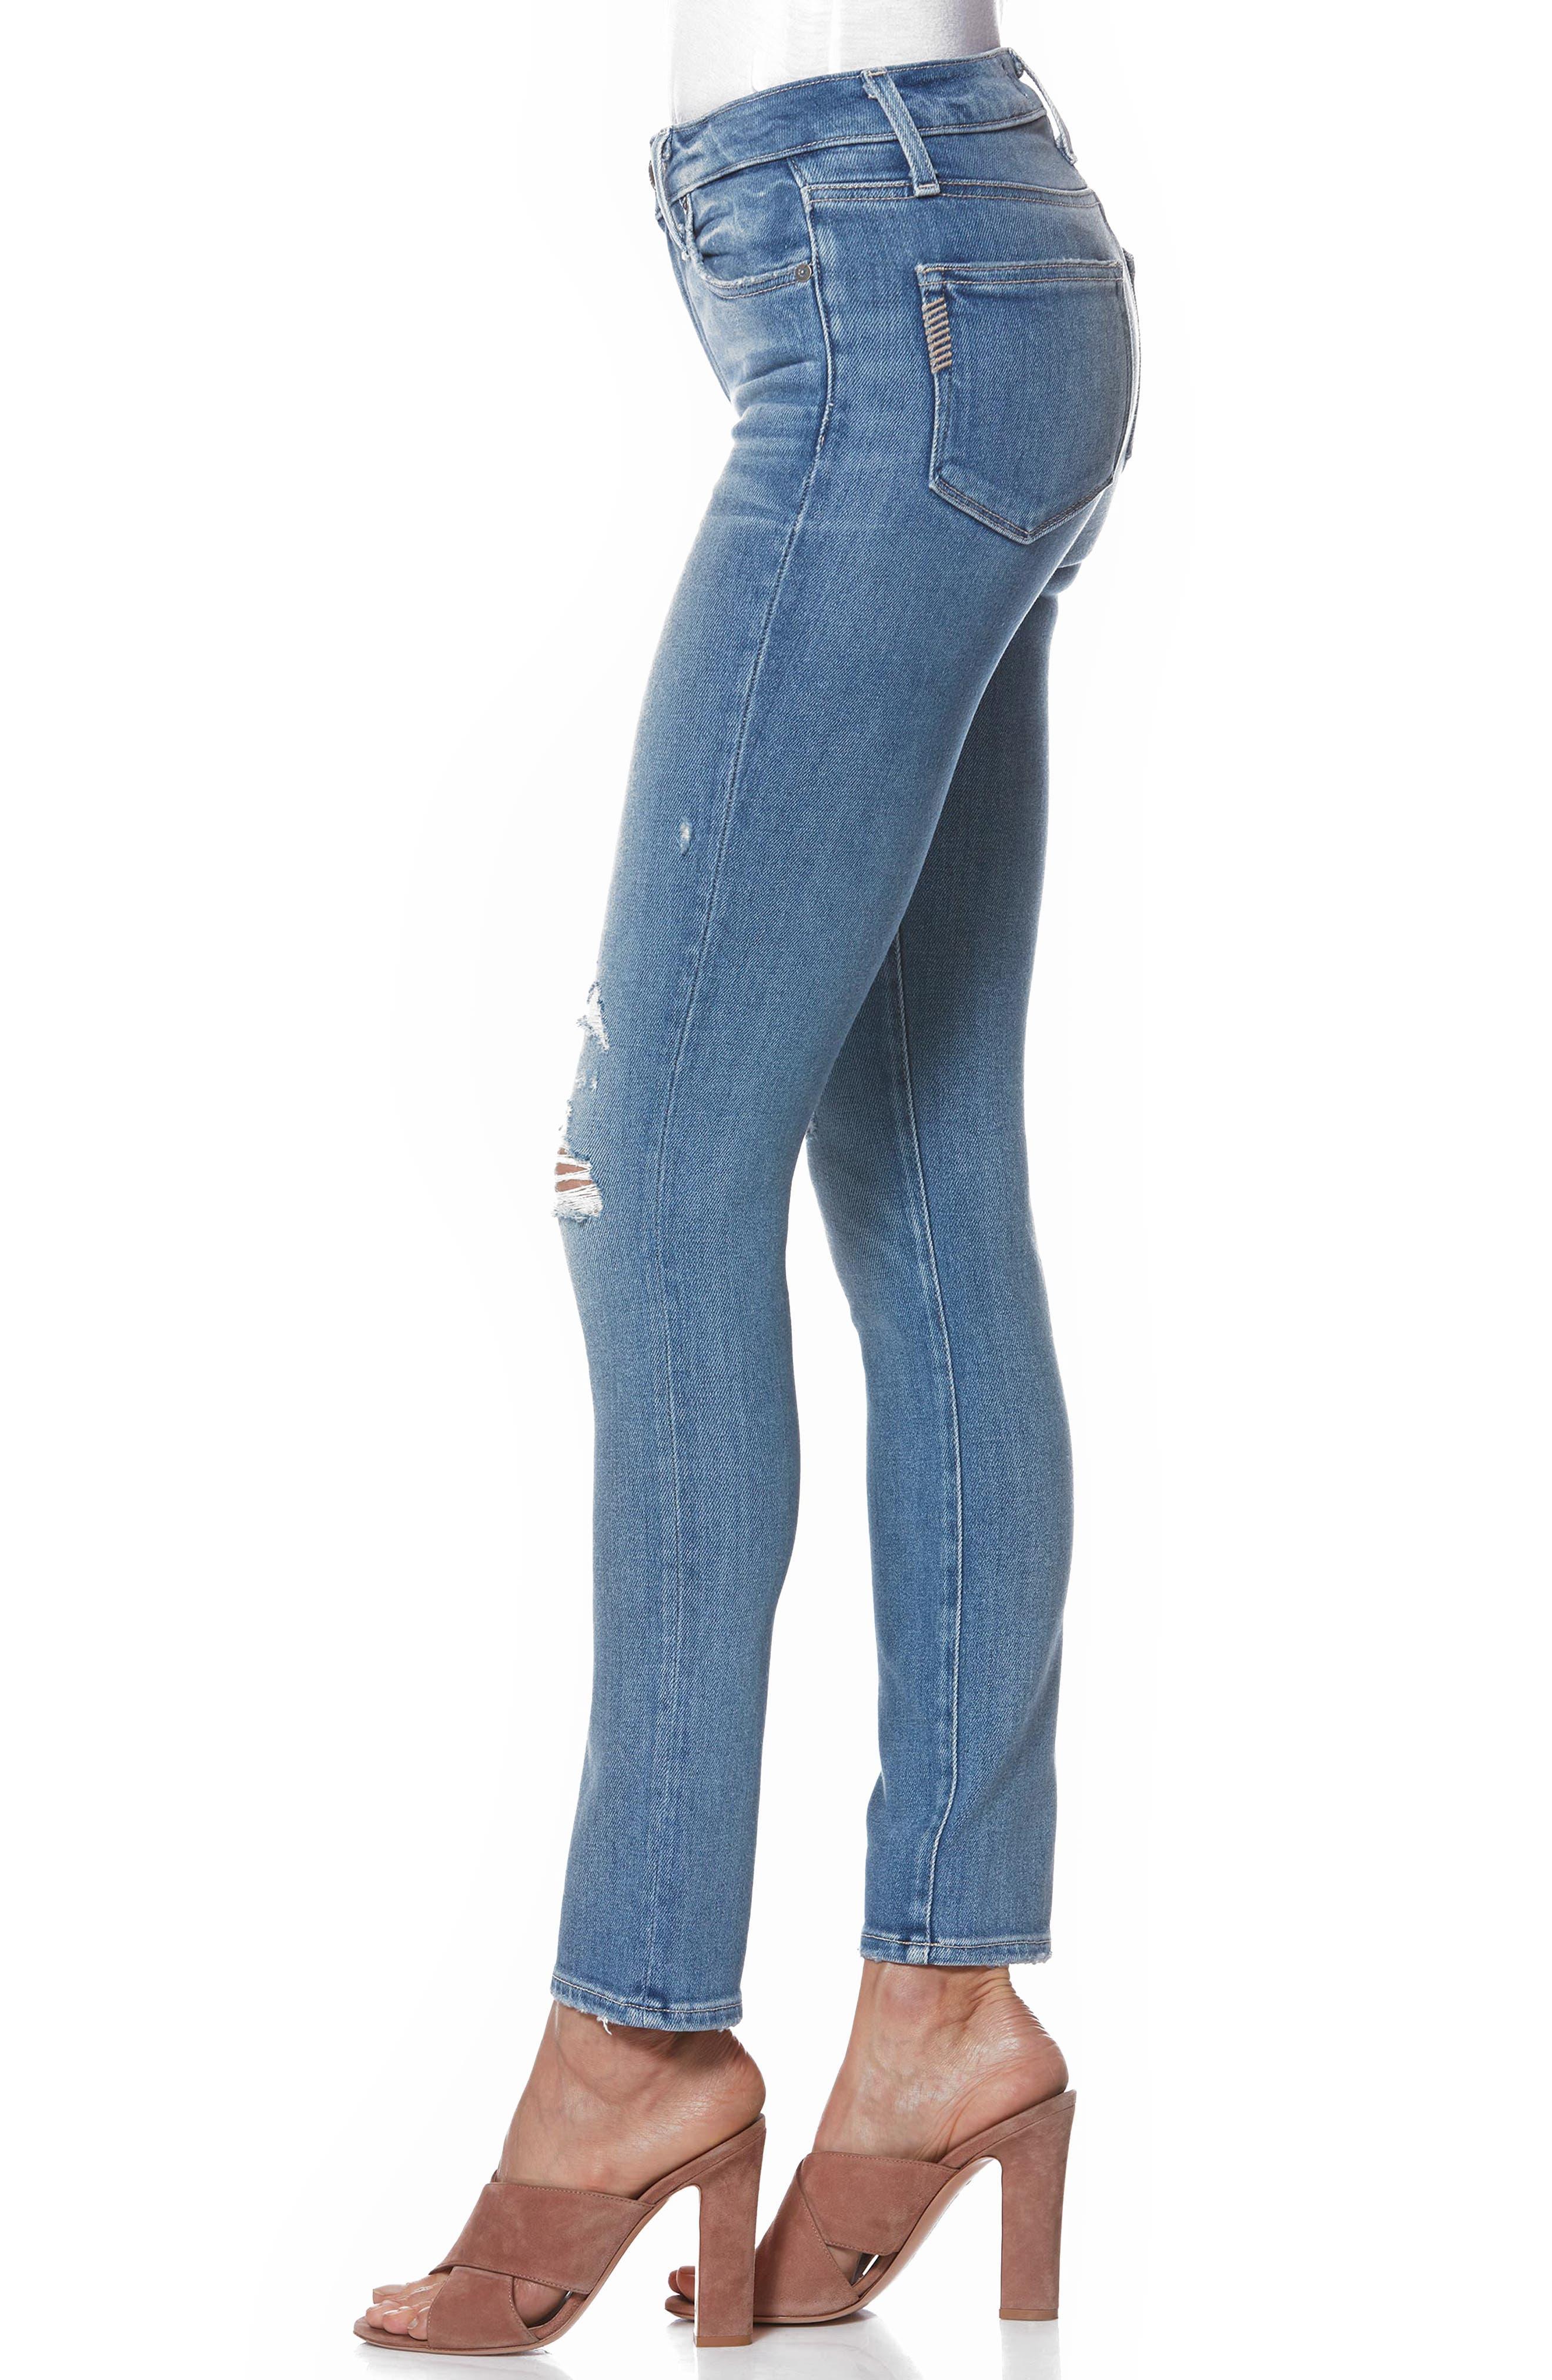 Hoxton High Waist Ankle Peg Jeans,                             Alternate thumbnail 3, color,                             KAYSON DISTRESSED